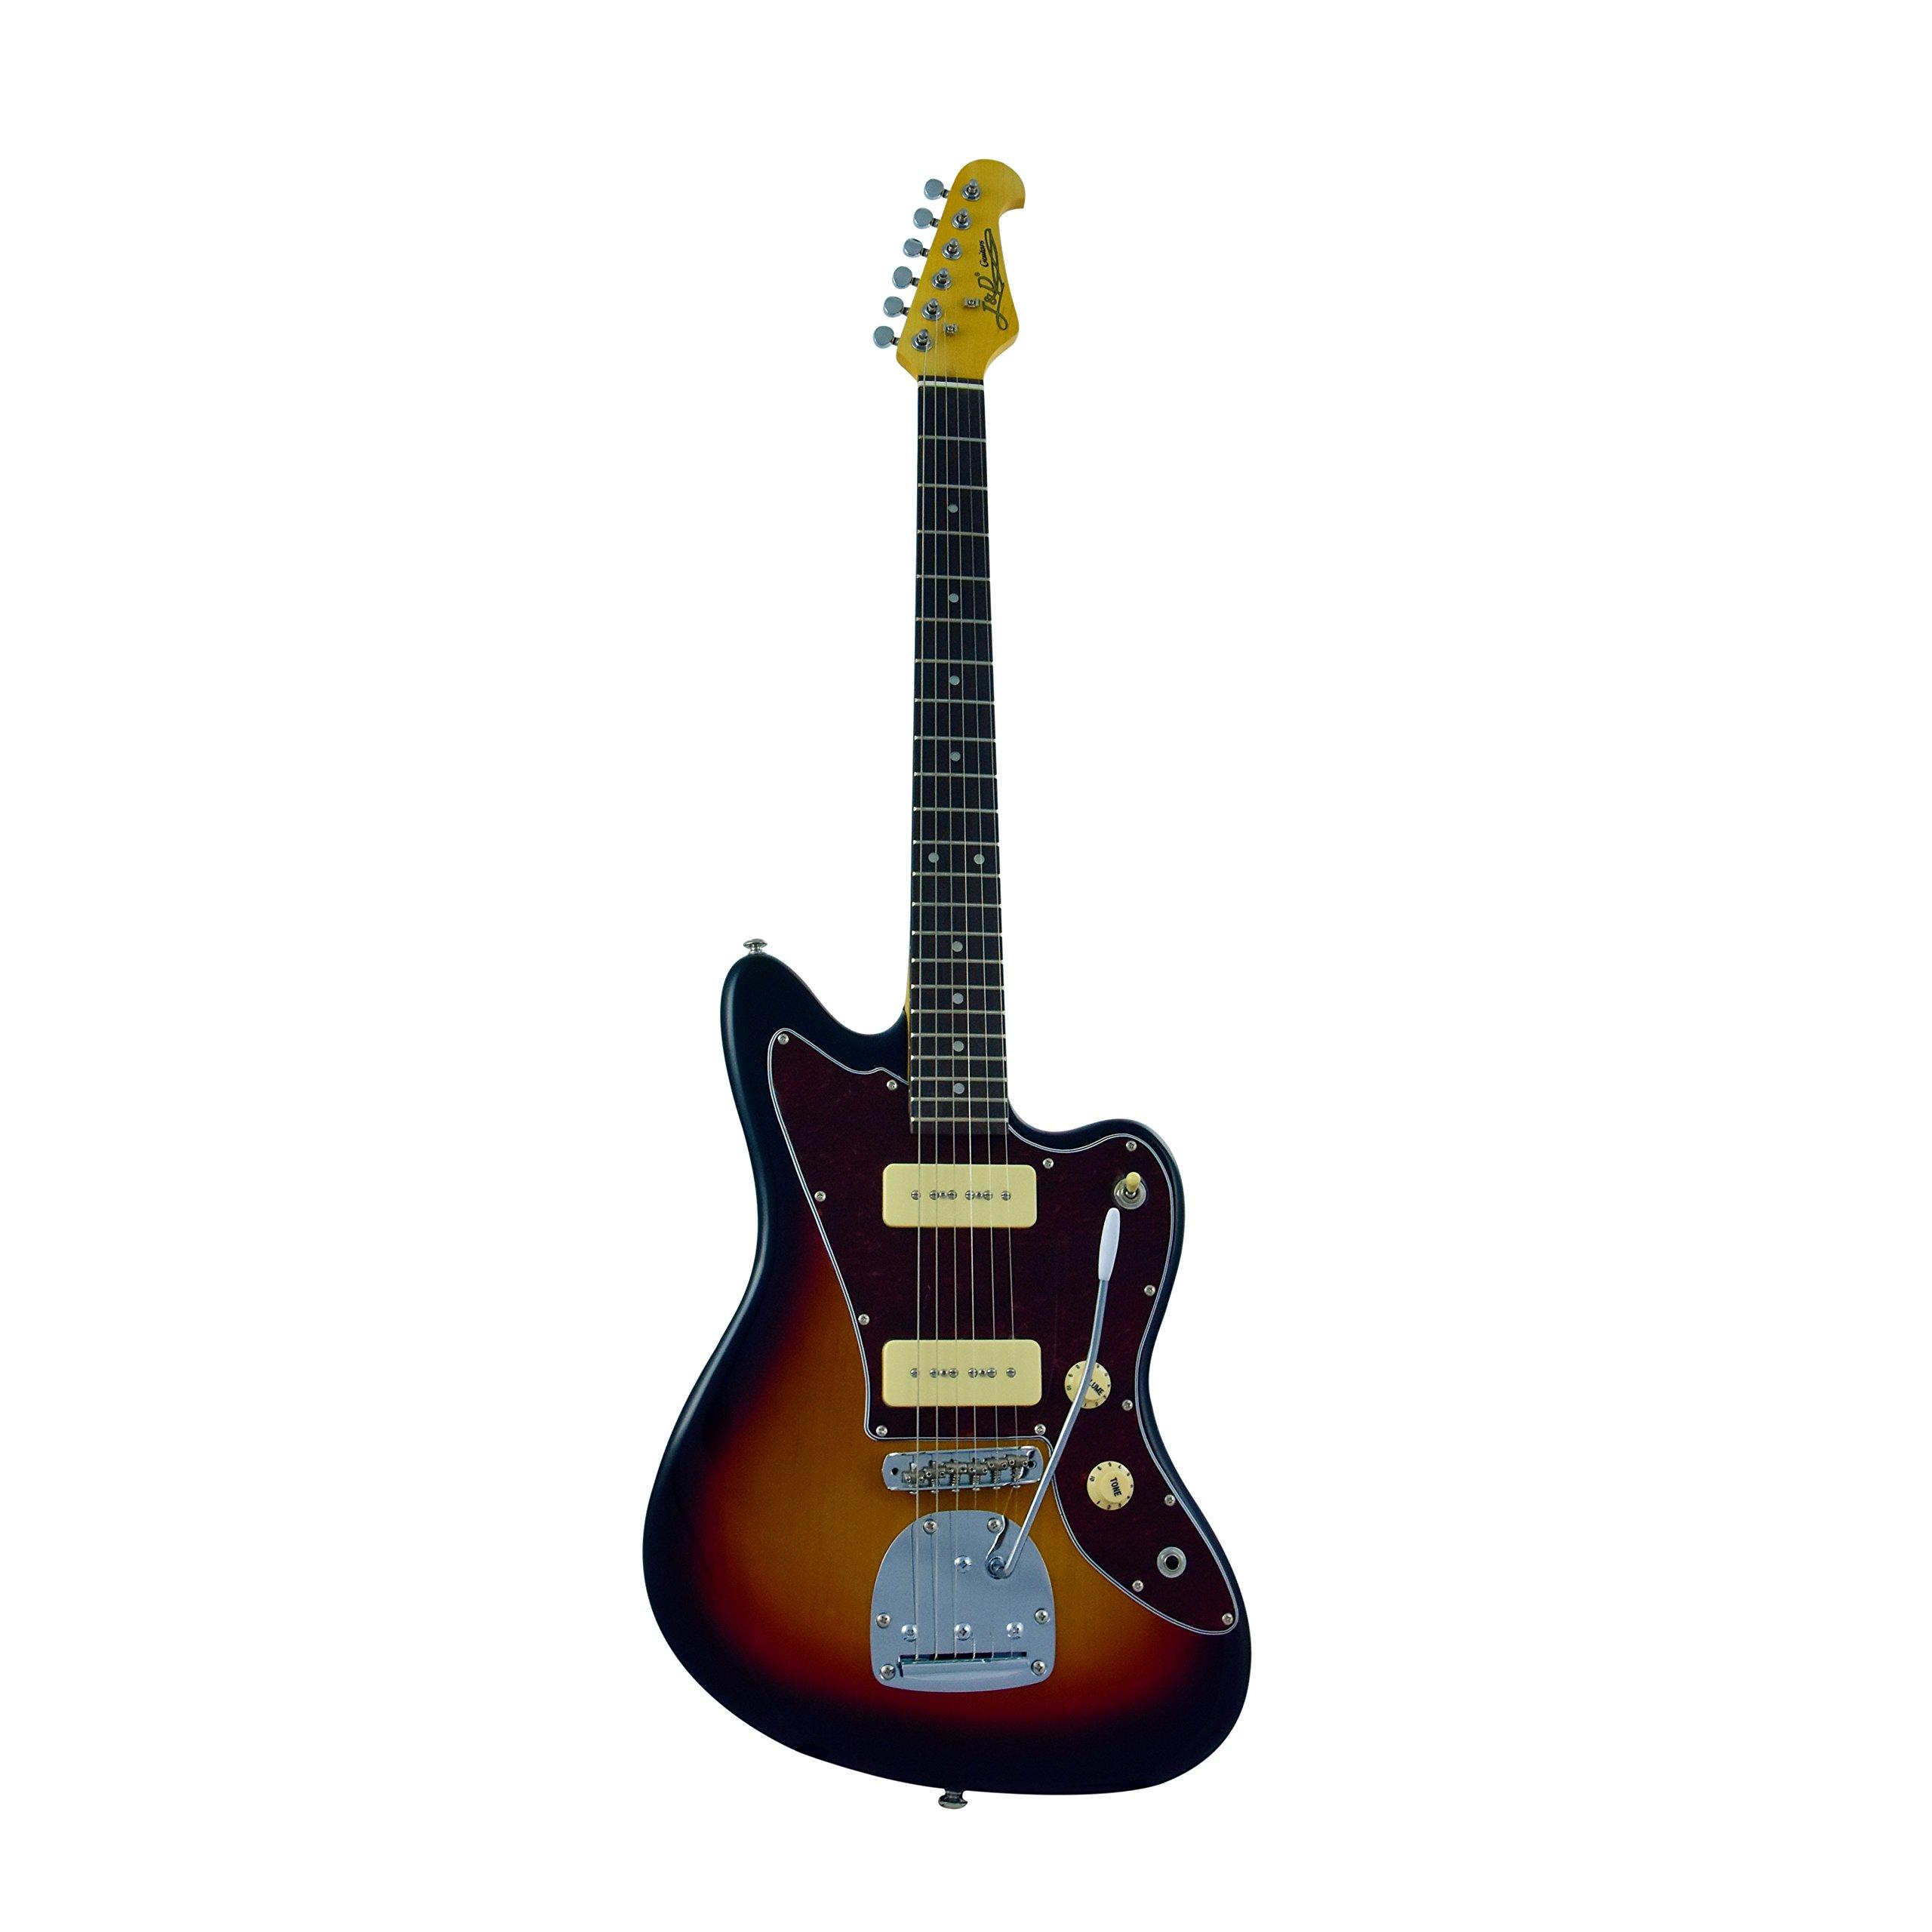 Cheap J&D JM Electric Guitar - Rosewood Fingerboard & Maple Neck Sunburst Finish by CNZ Audio Black Friday & Cyber Monday 2019